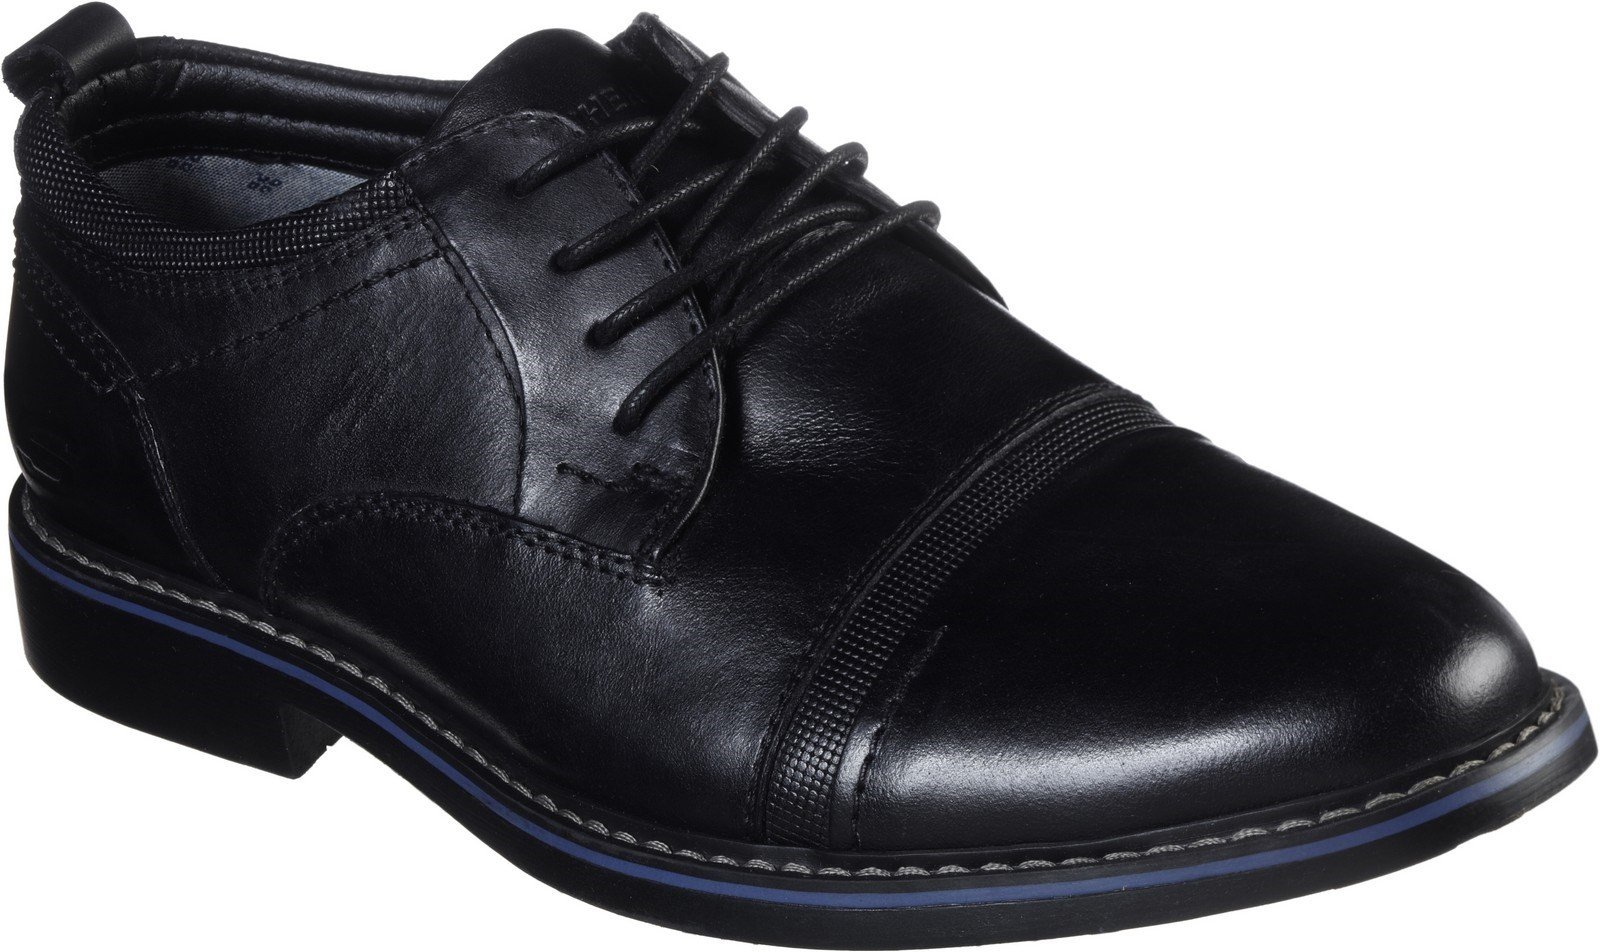 Skechers Men's Bregman Selone Lace Up Shoe 30748 - Black 6